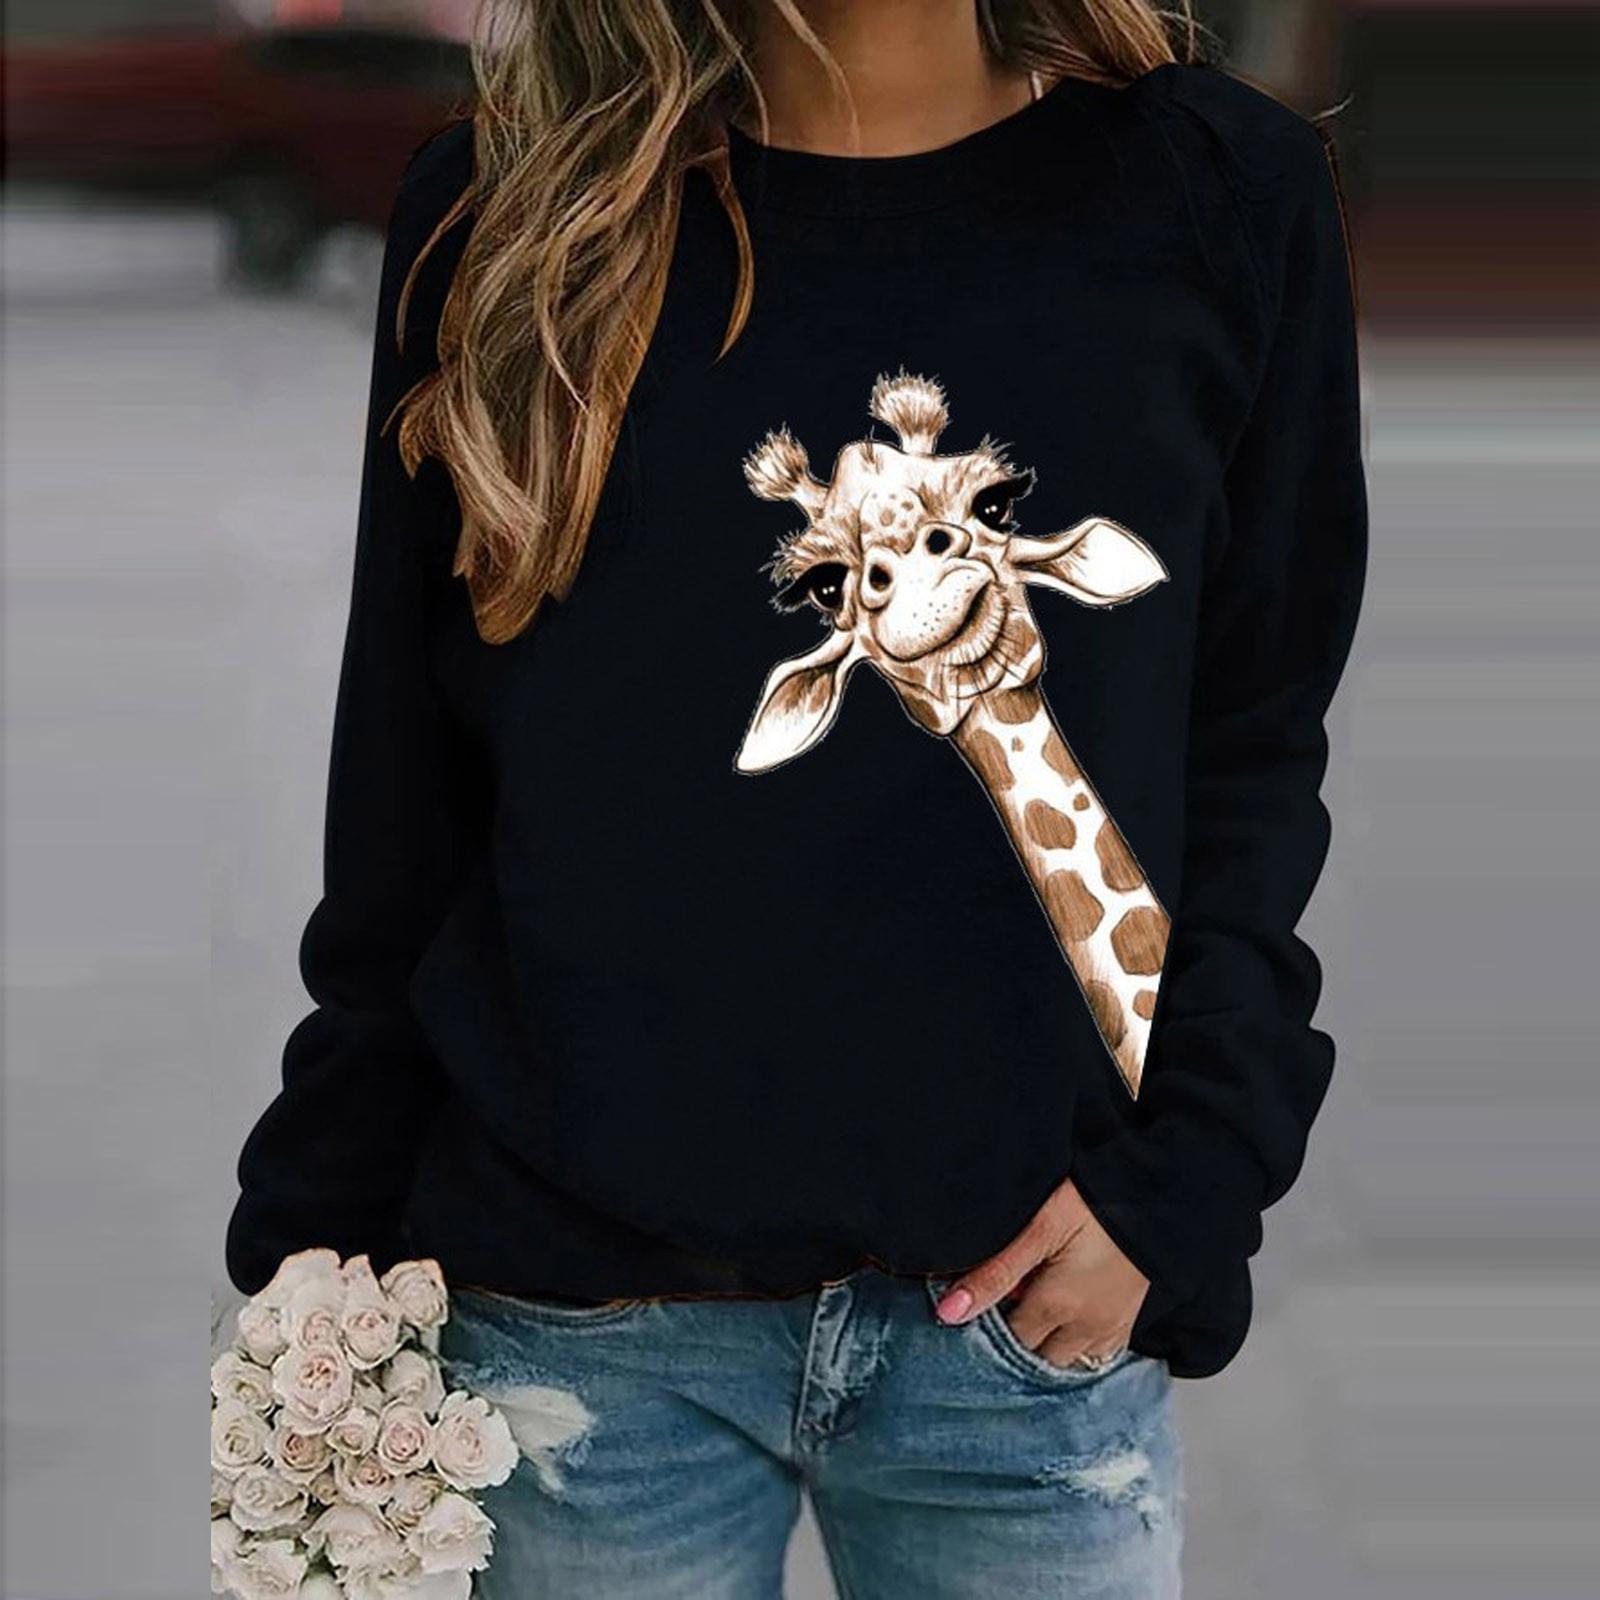 4# Womens Winter Sweaters Casual Long Sleeve Tops Ladies Giraffe Print Sweaters Tee Sweater Elegant Pullover Autumn Худи 2020